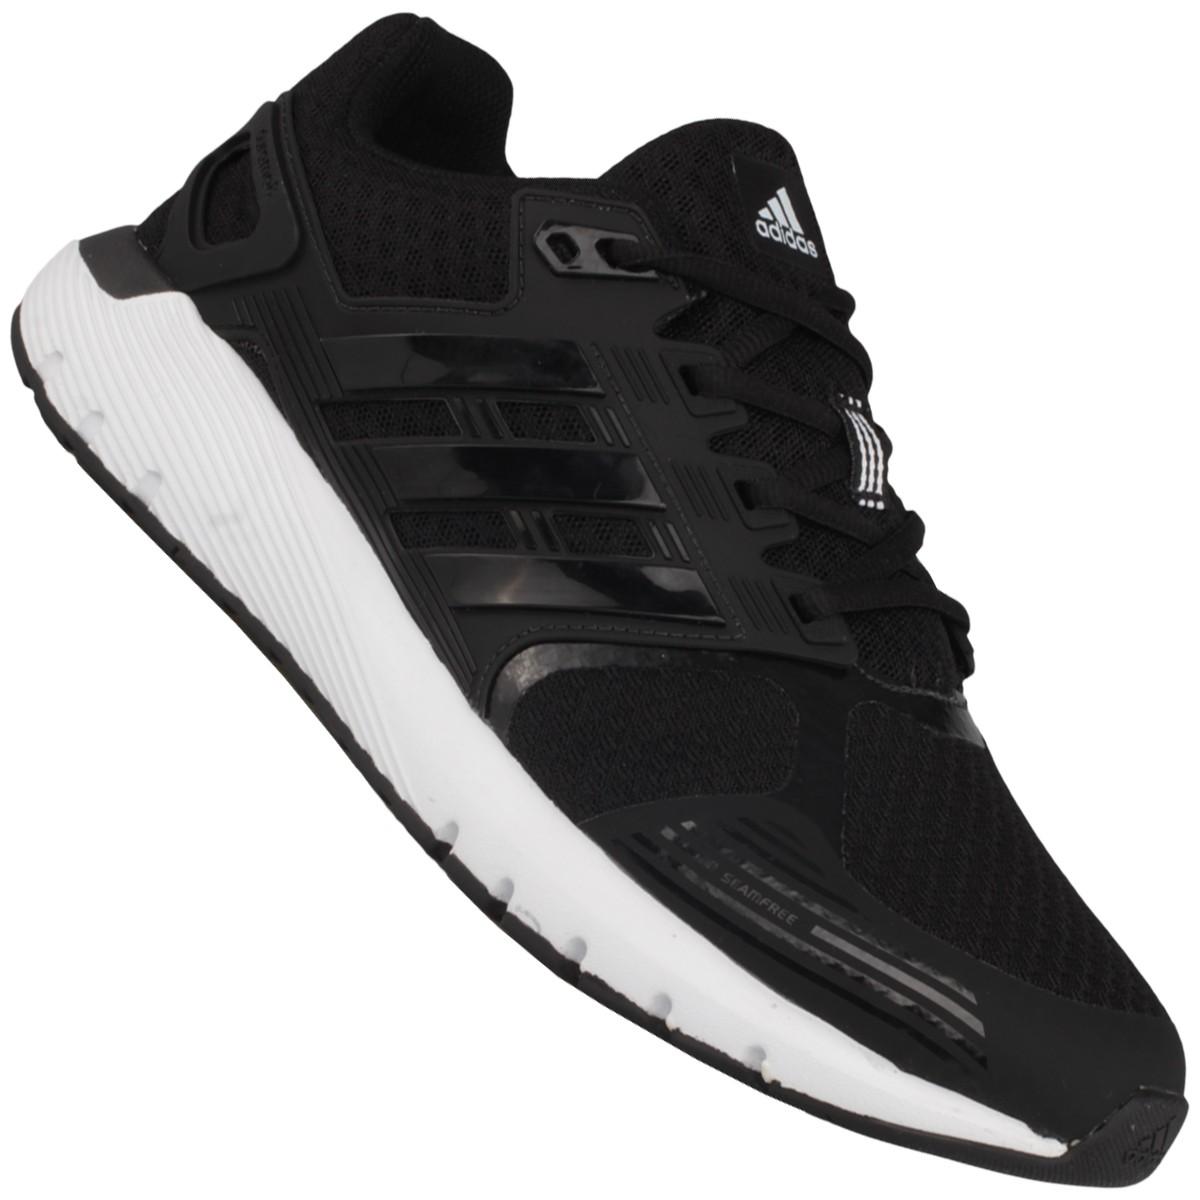 e49ec4e2b6eeb Tênis Adidas Duramo 8 M